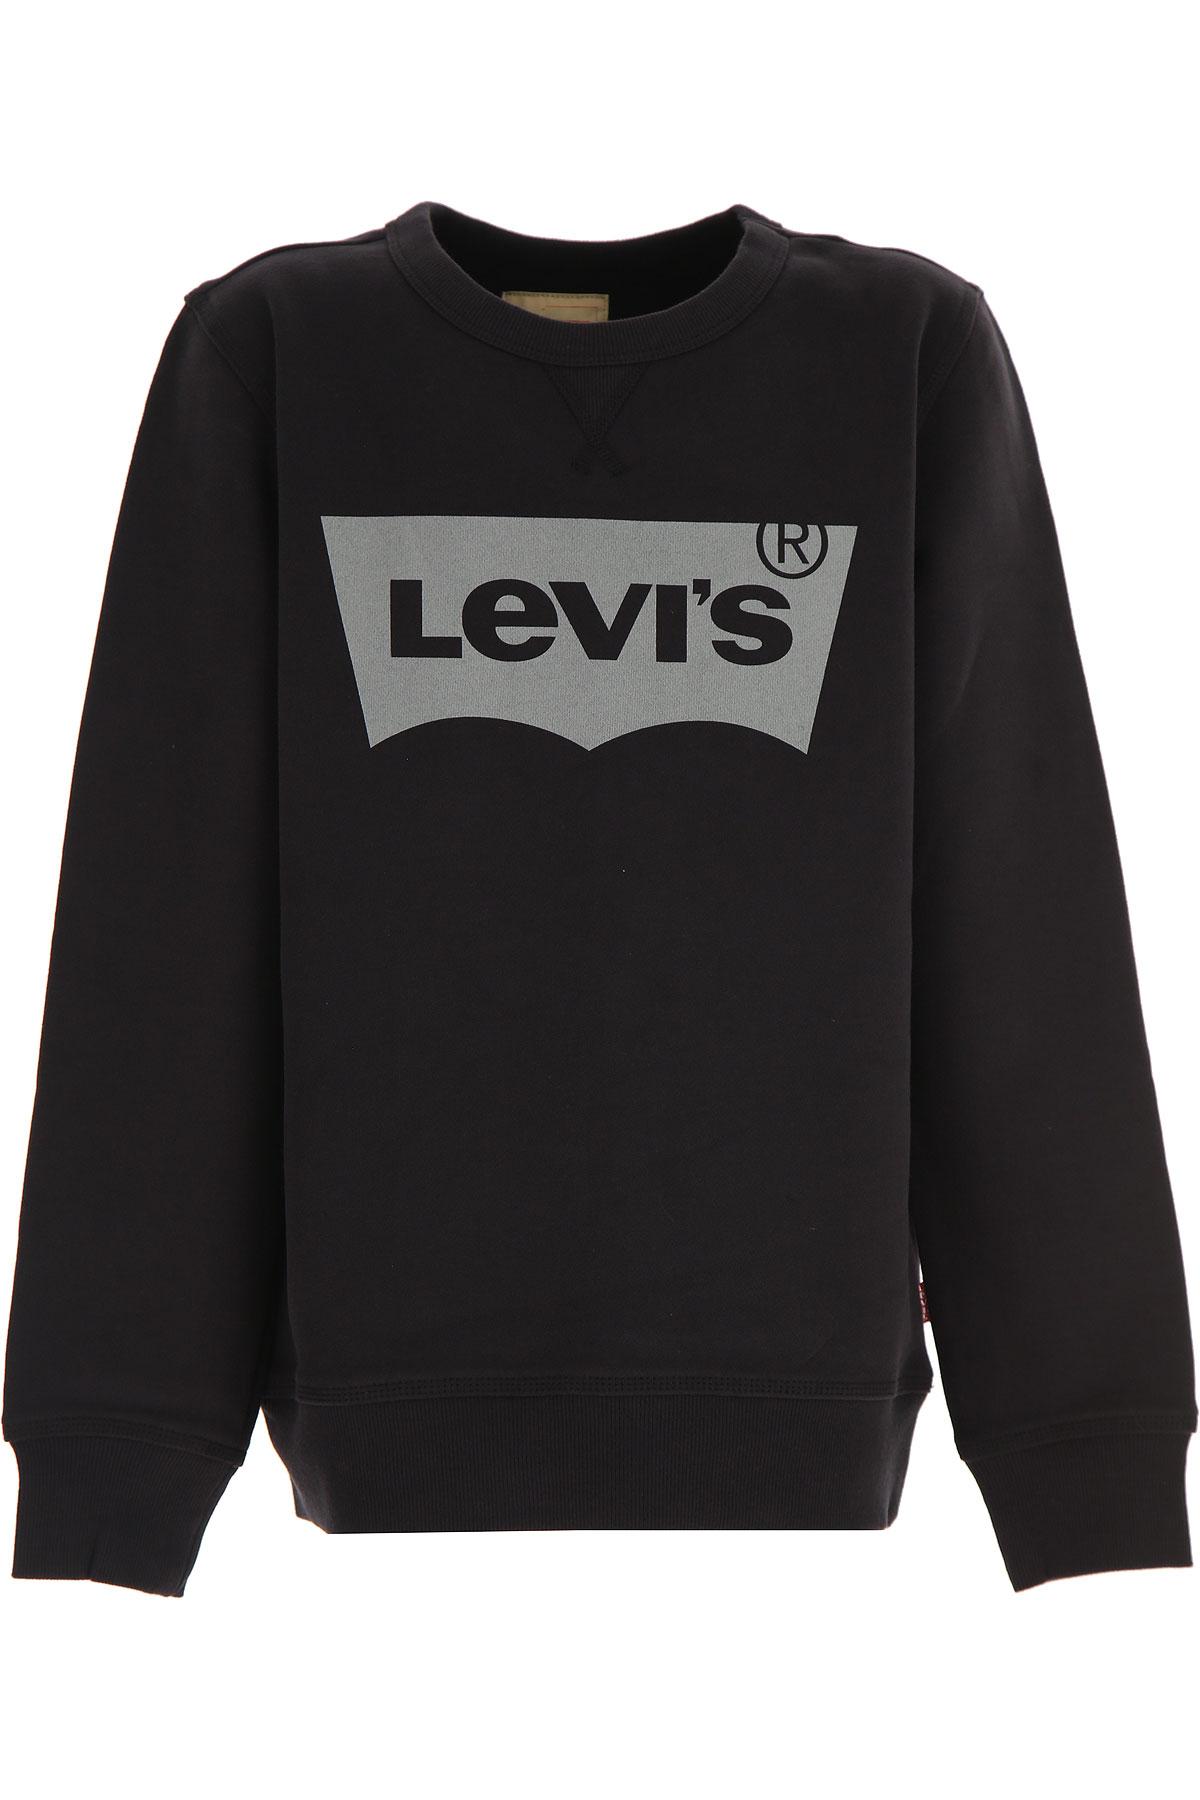 Levis Kids Sweatshirts & Hoodies for Boys On Sale, Black, Cotton, 2019, 10Y 14Y 8Y